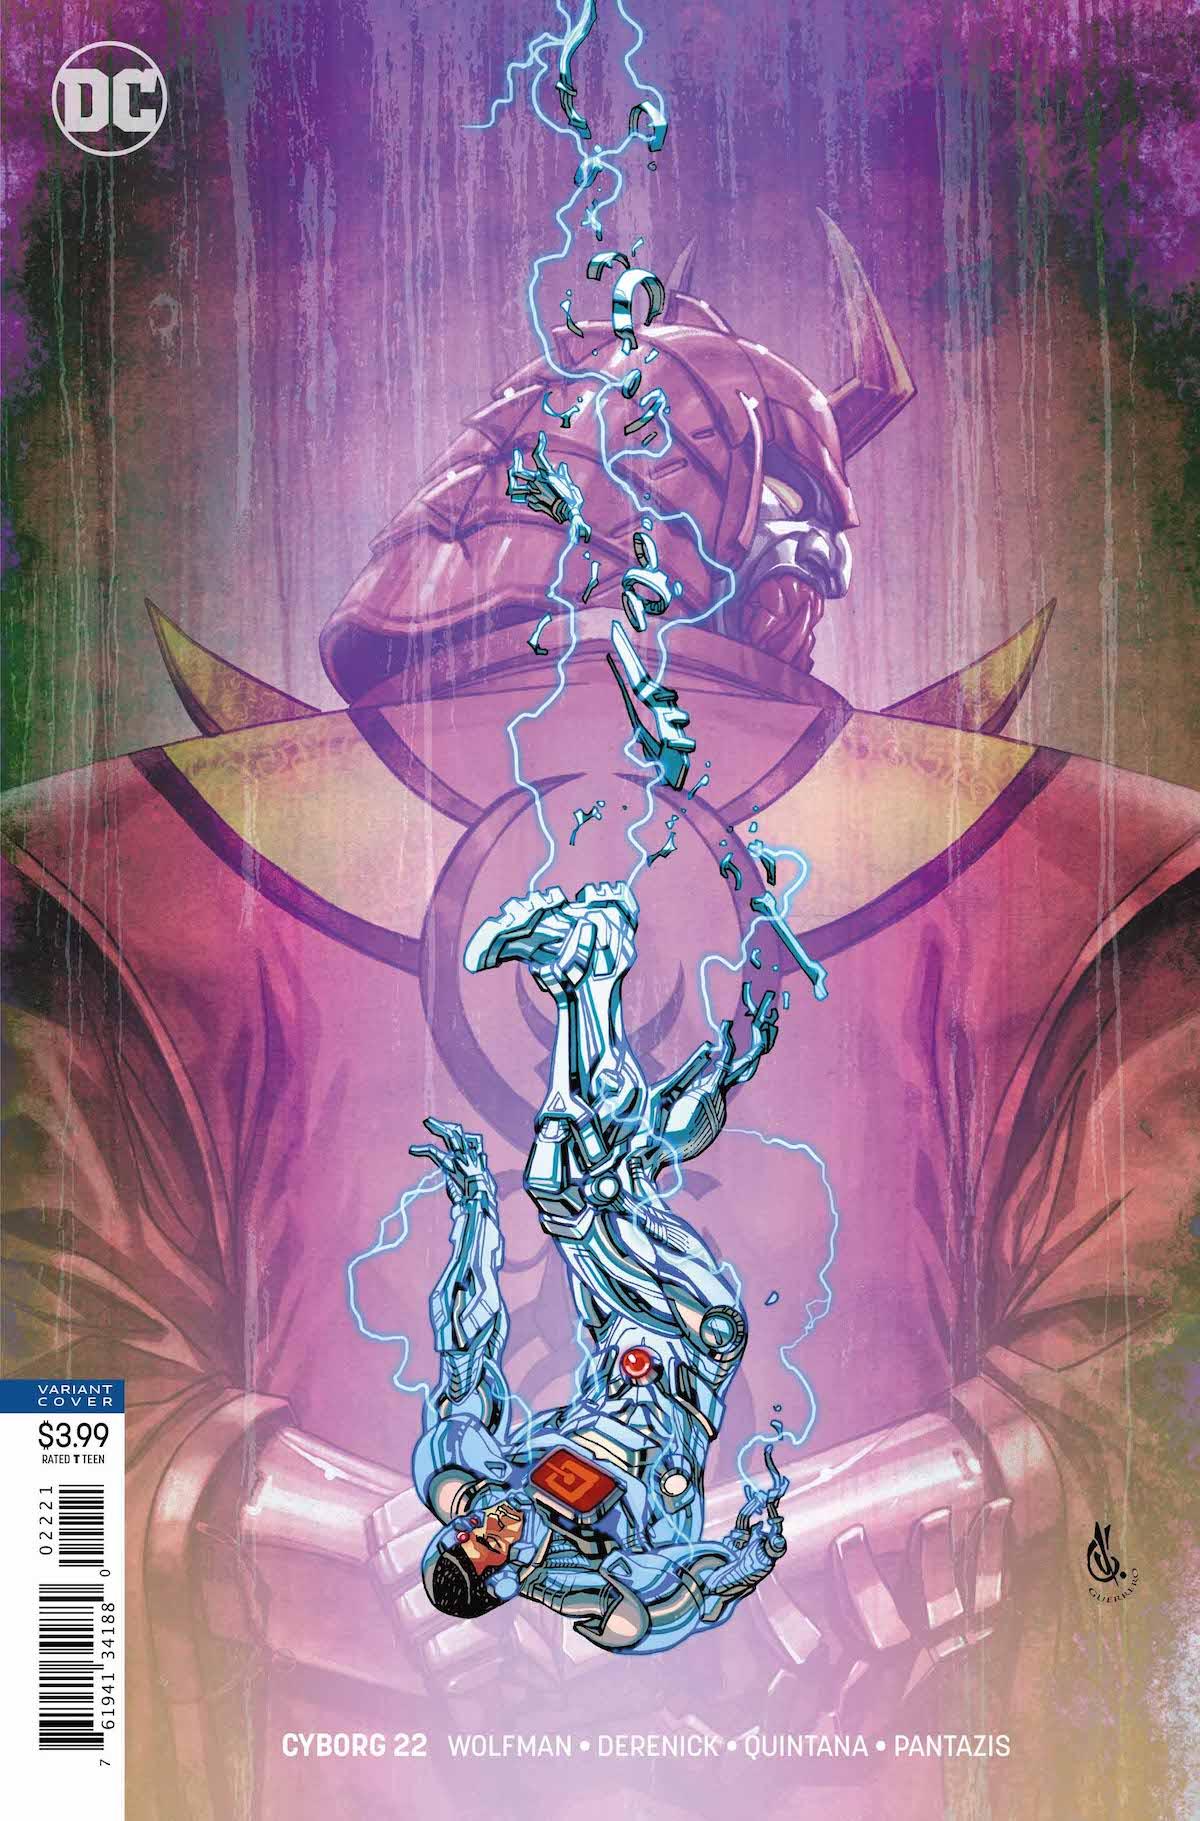 Cyborg #22 variant cover